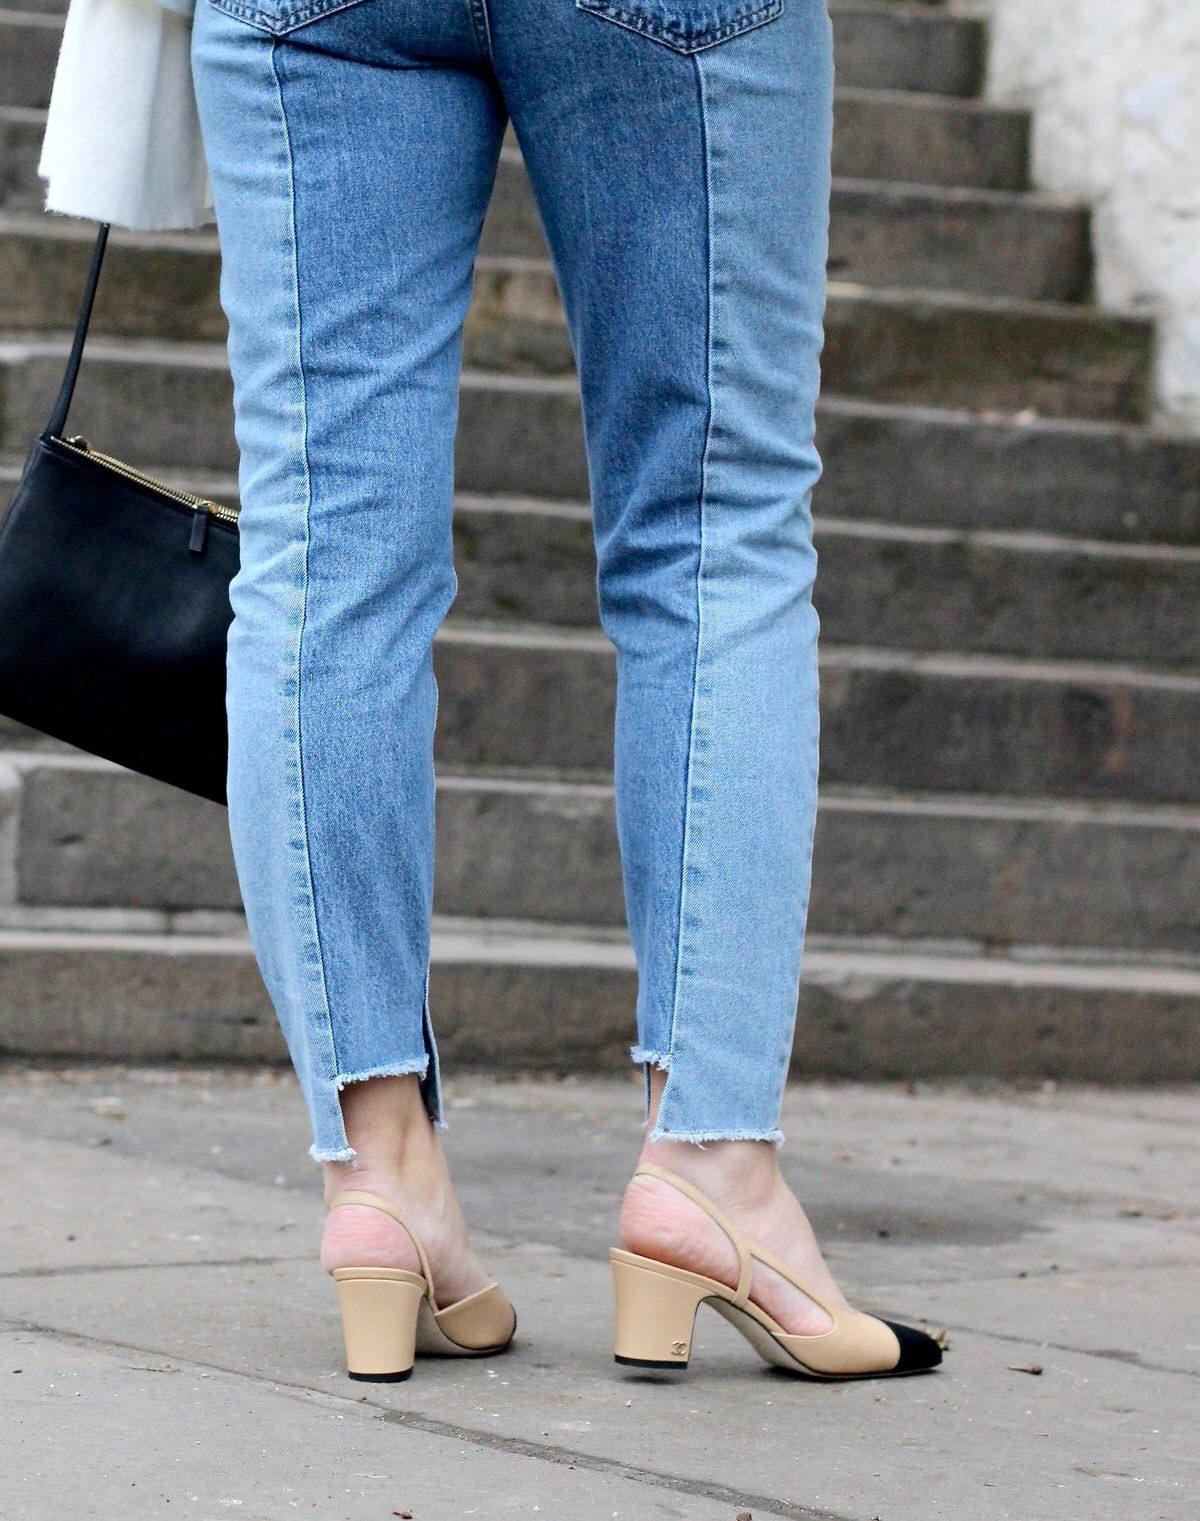 Chanel Slingback Pumps, Cropped Jeans, Rüschen Pullover, Celine Trio Bag, Streetstyle, Fashionblogger